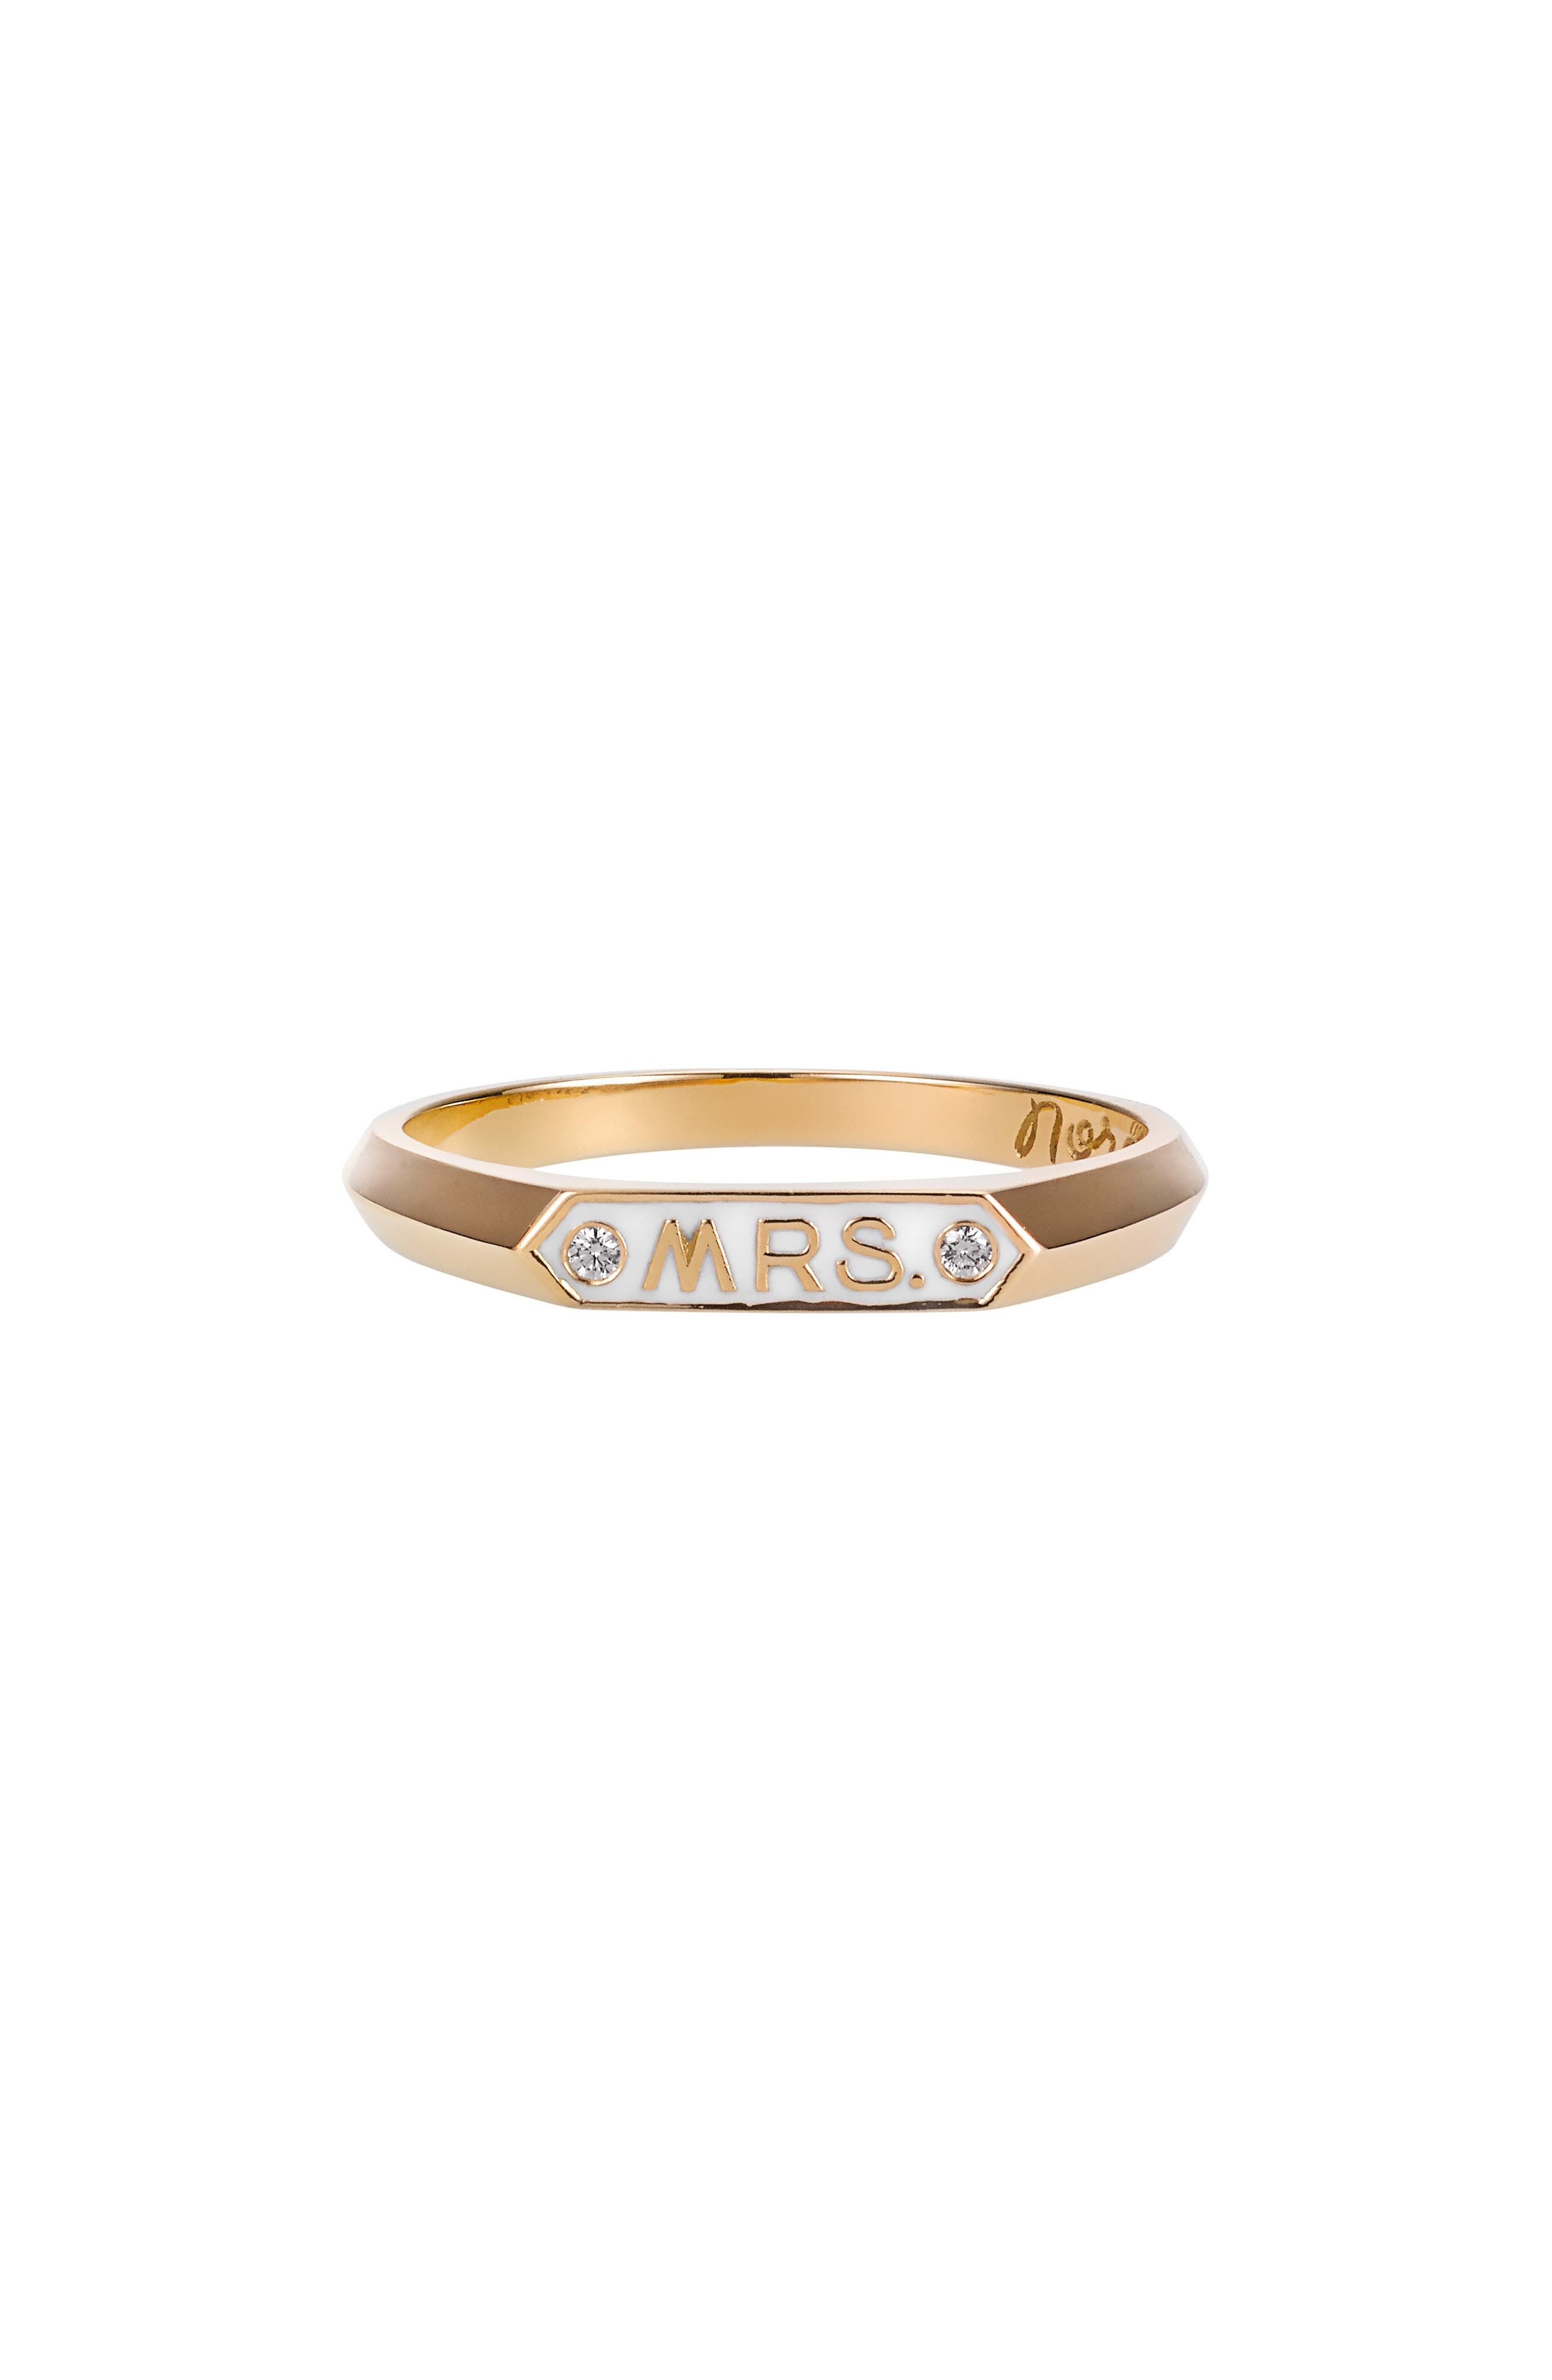 Mrs. Signet Enamel Ring,                             Main thumbnail 1, color,                             Yellow Gold